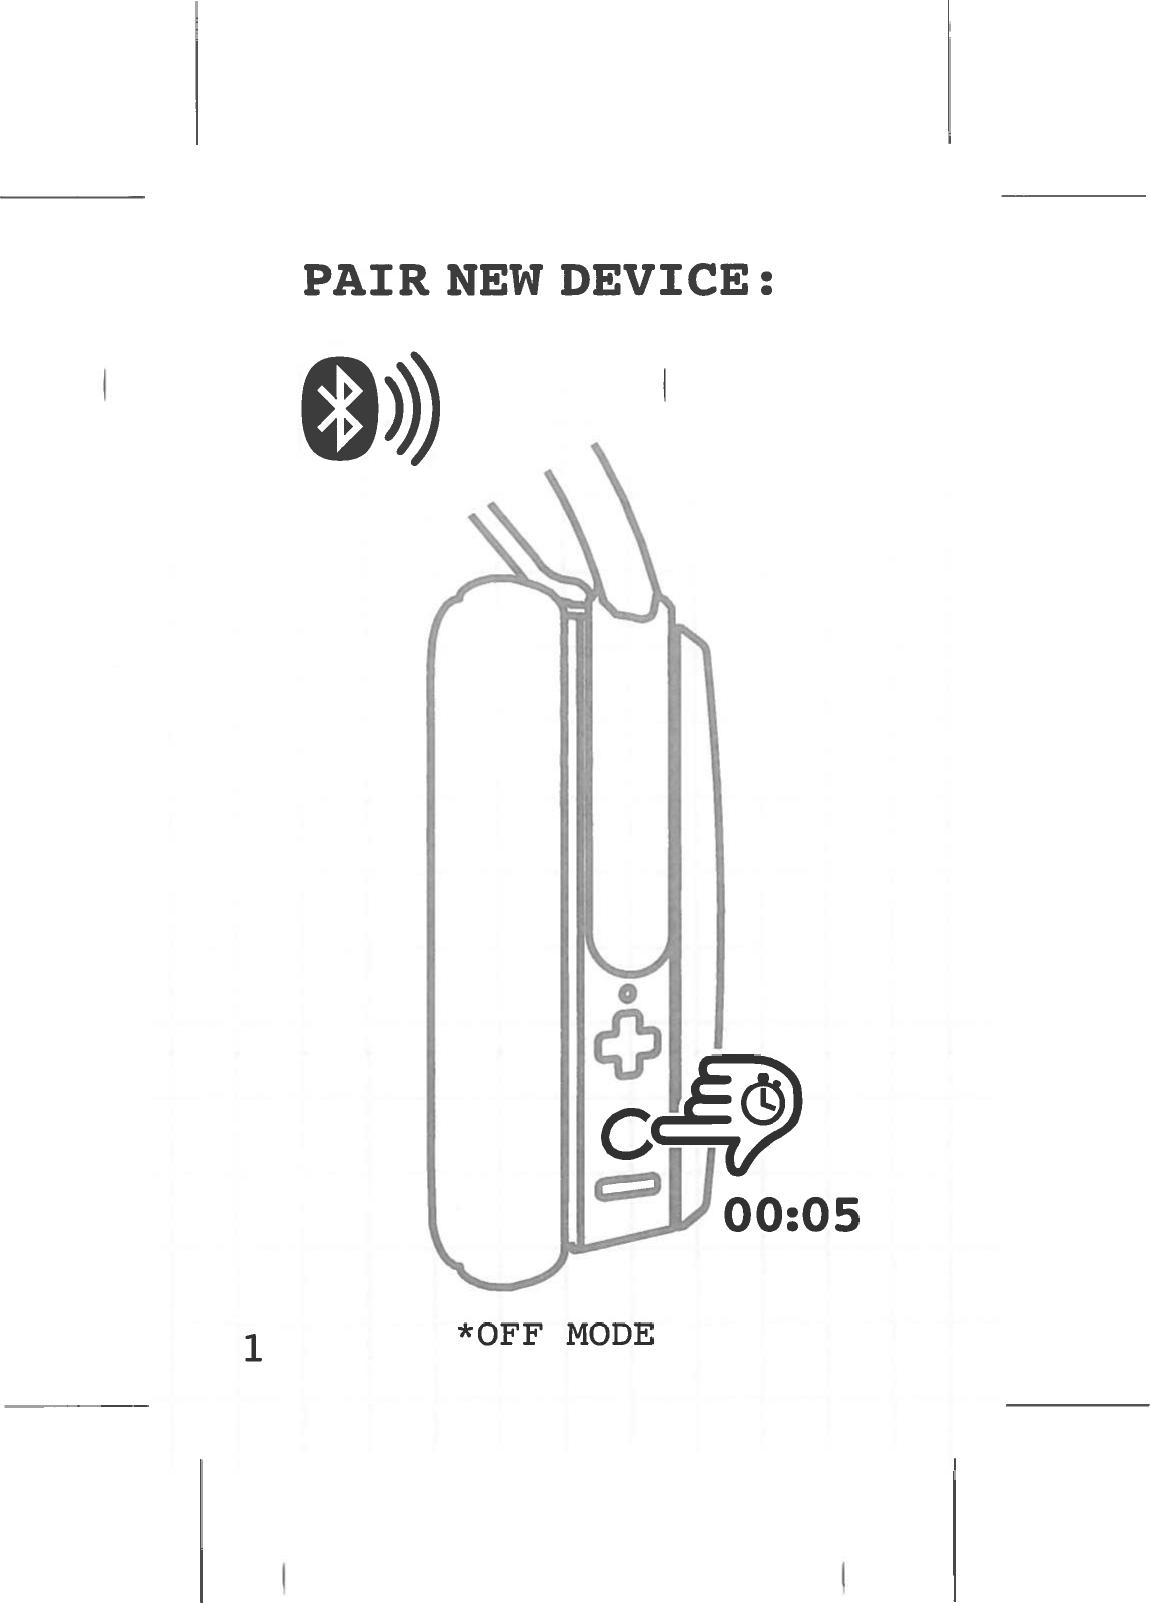 Skuandy S6CRW Crusher Wireless User Manual